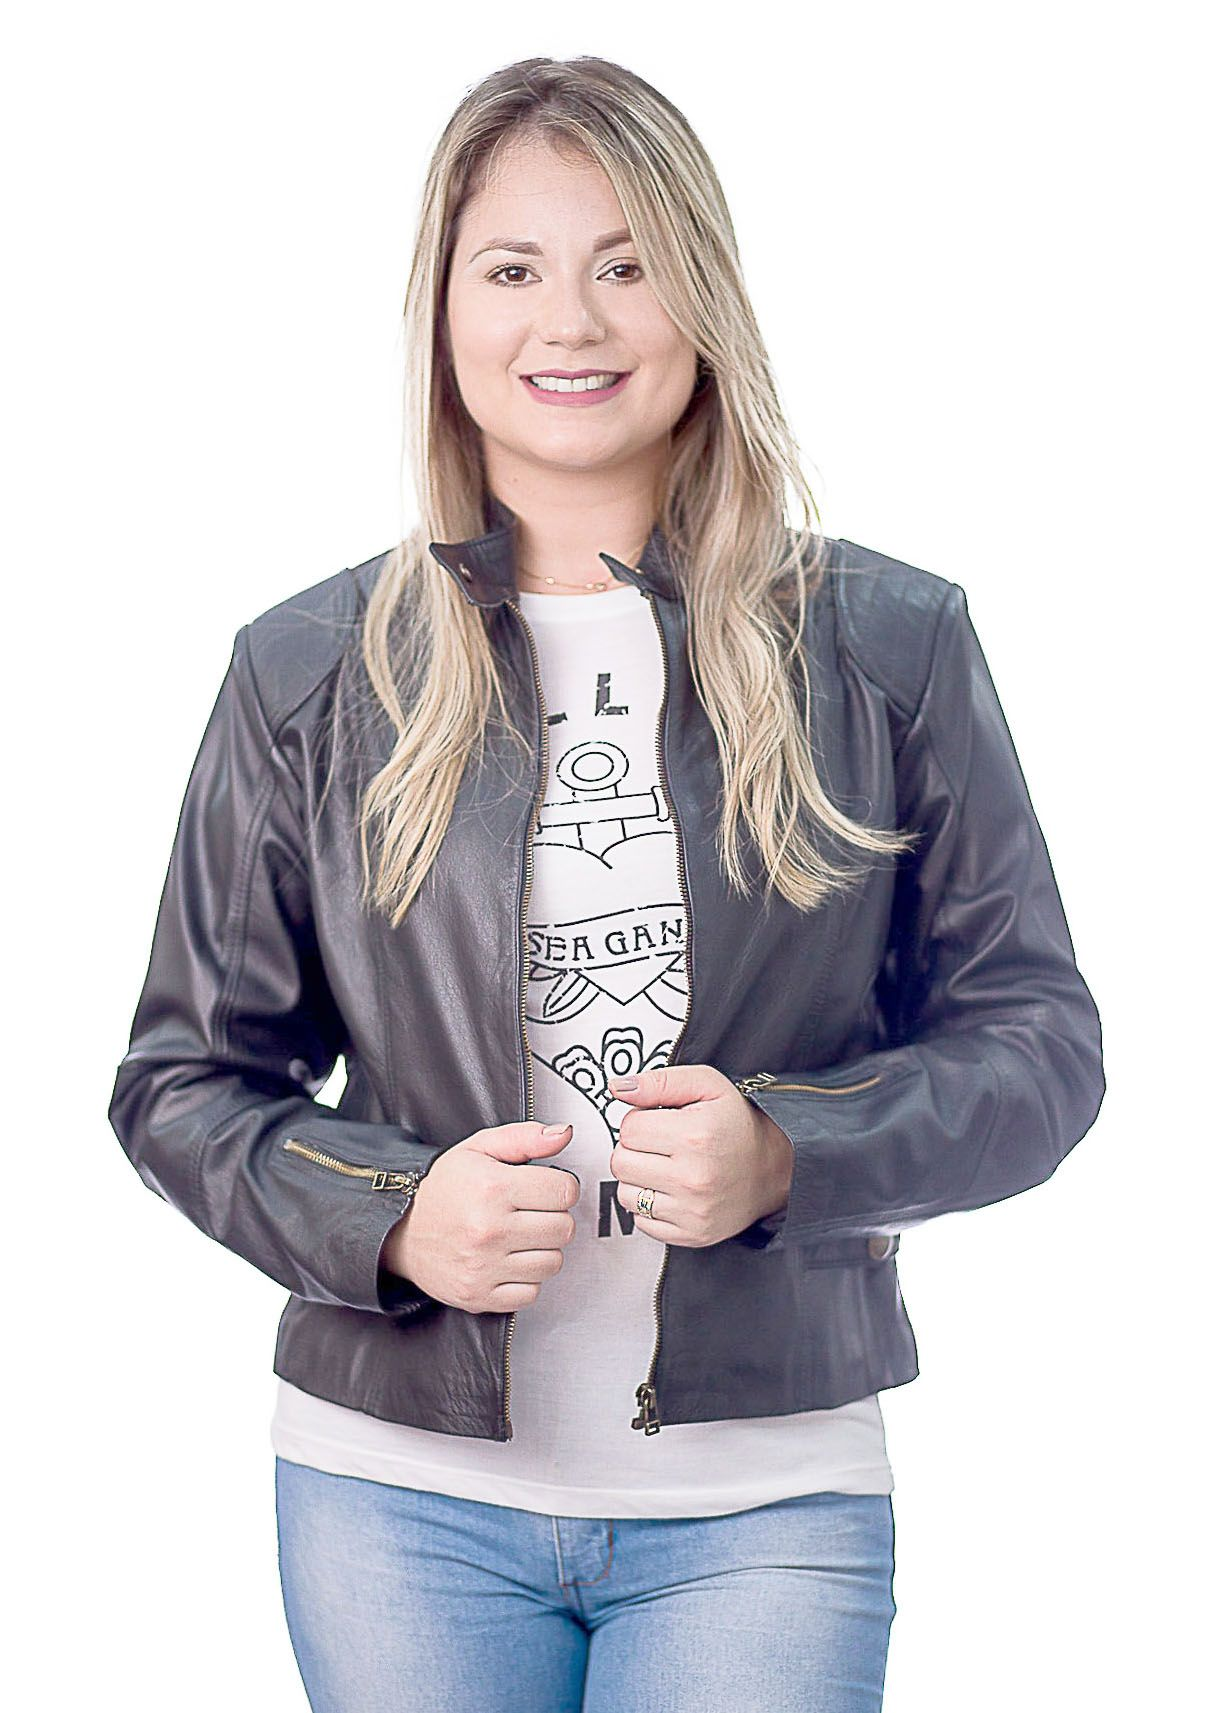 Jaqueta Feminina Prata Couro 111 Preta